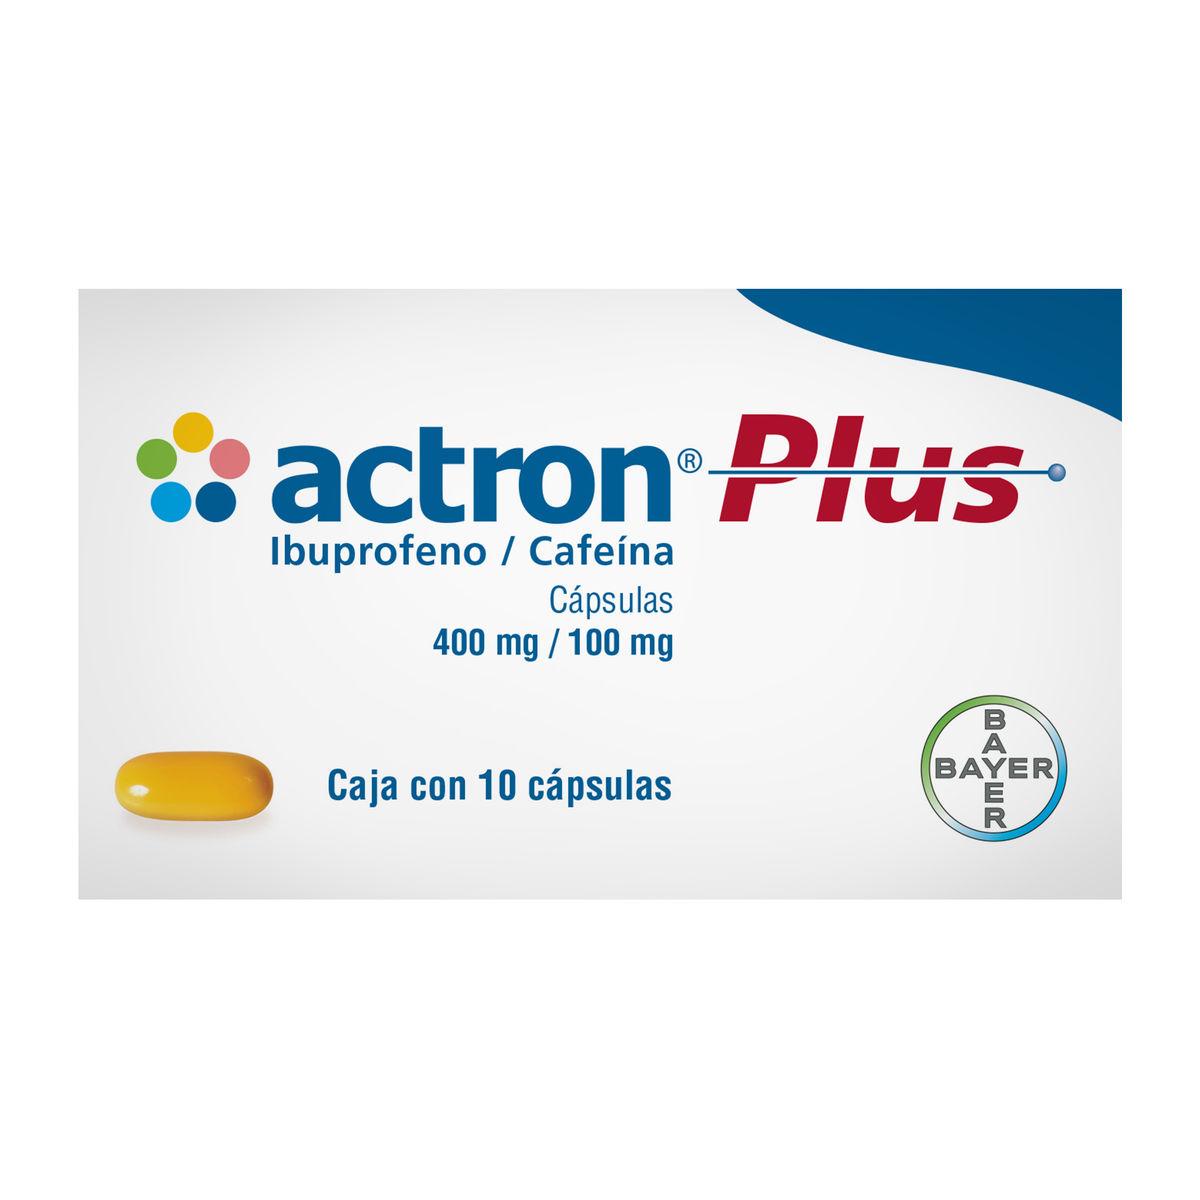 Actron Plus 400/100 Mg Caja 10 Capsulas